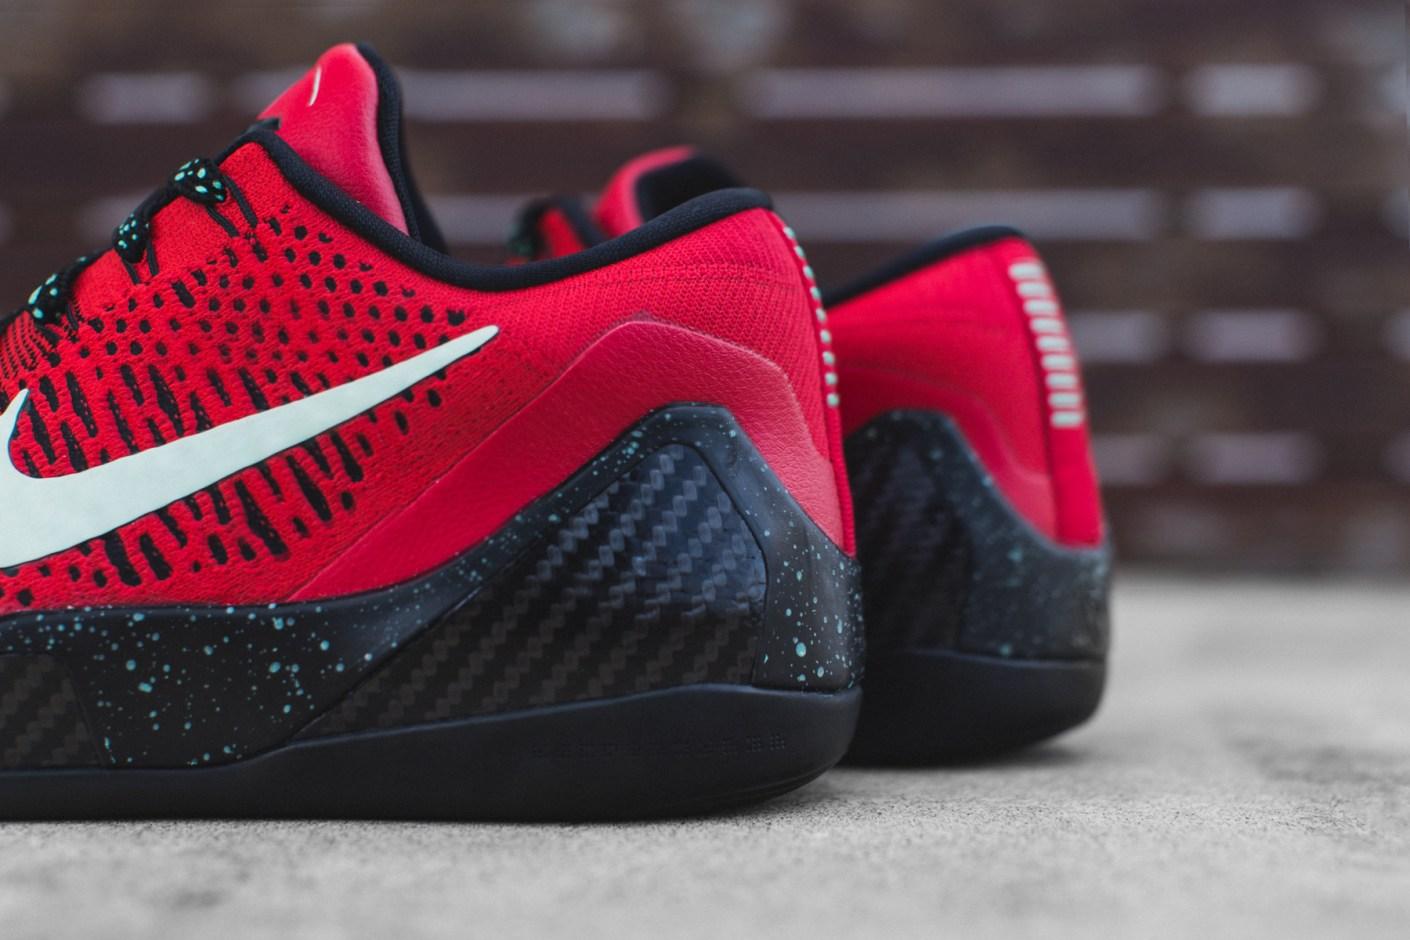 Image of Nike Kobe 9 Elite Low University Red/Black